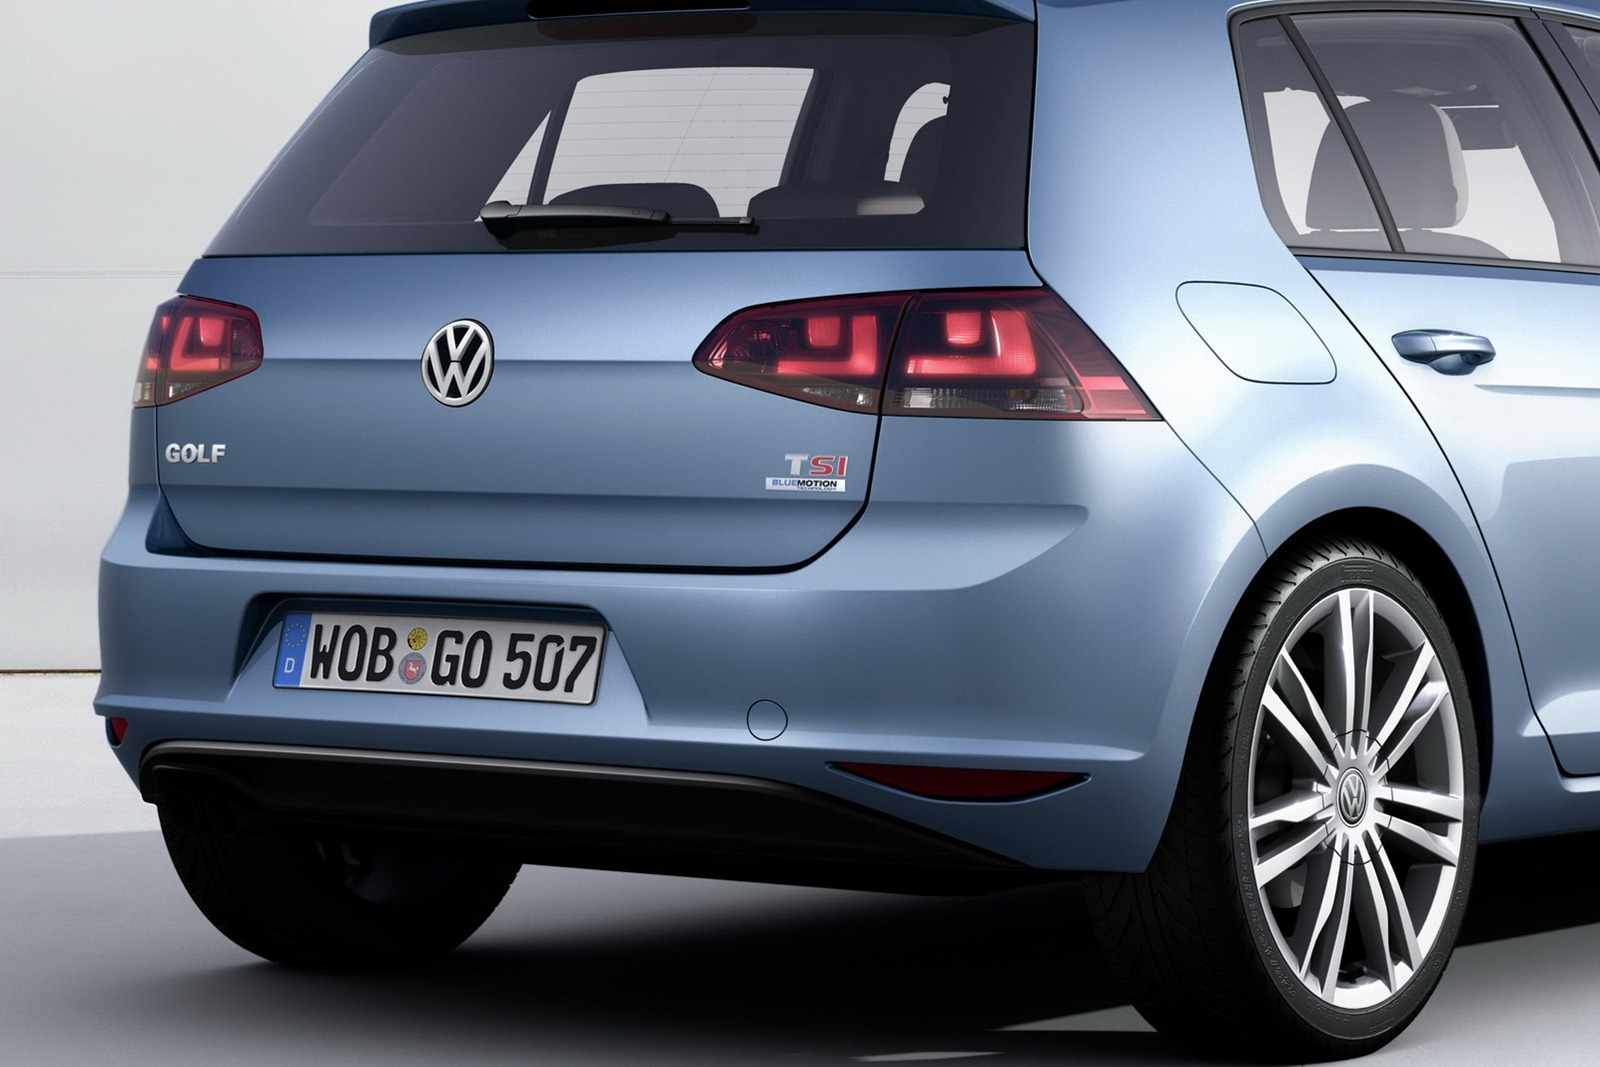 2013 Volkswagen Golf Mk7 17 628x418 2013 Volkswagen Golf Mk7 17